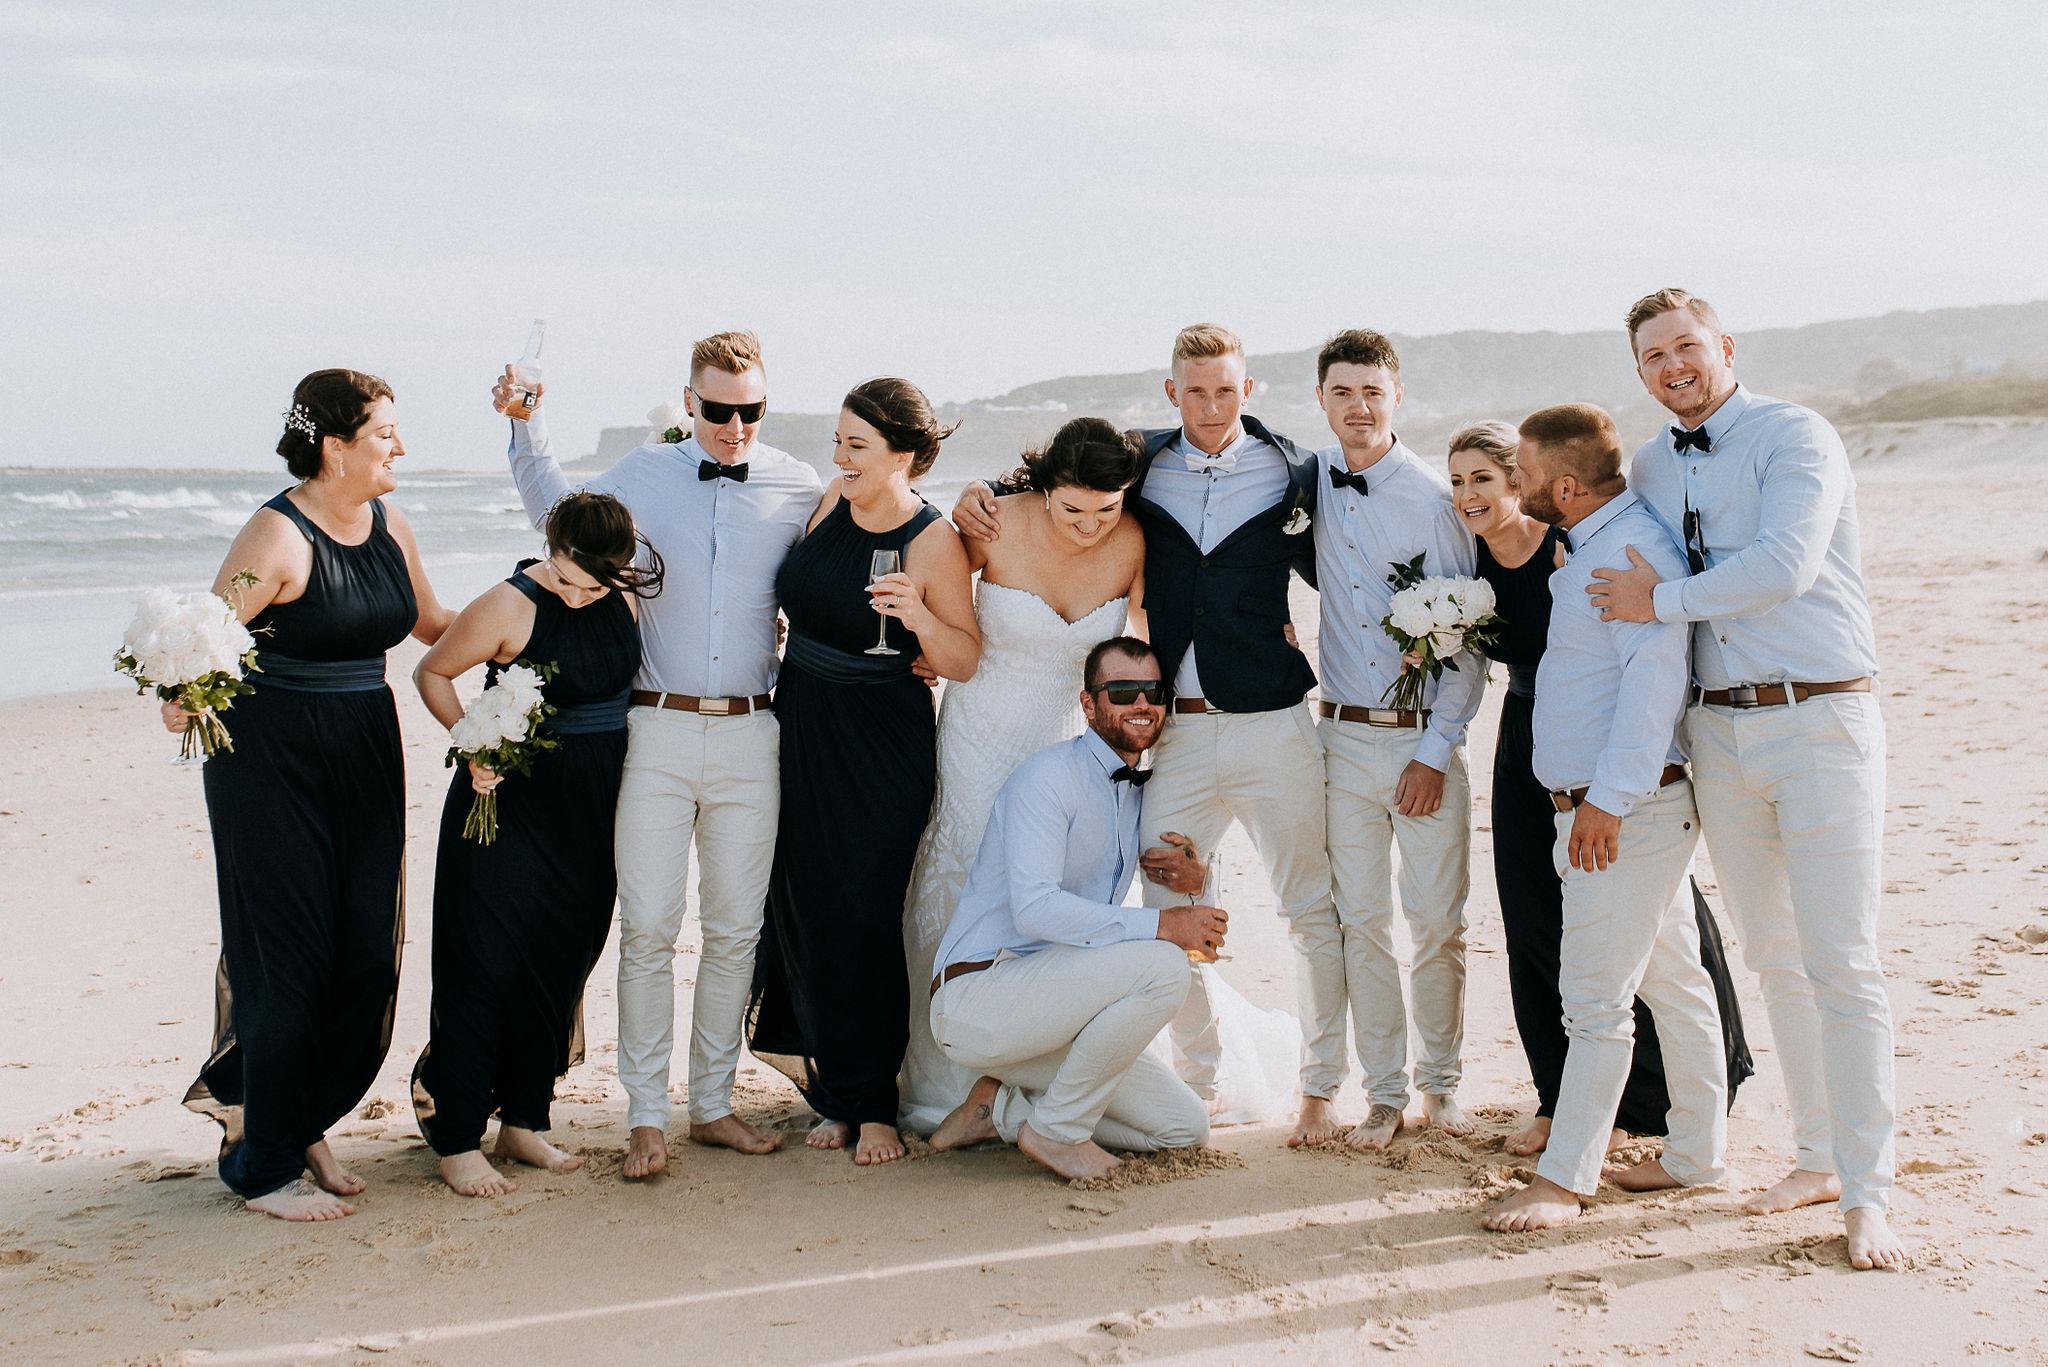 CAVES-BEACH-HOTEL-WEDDING-PATTEN-959.jpg